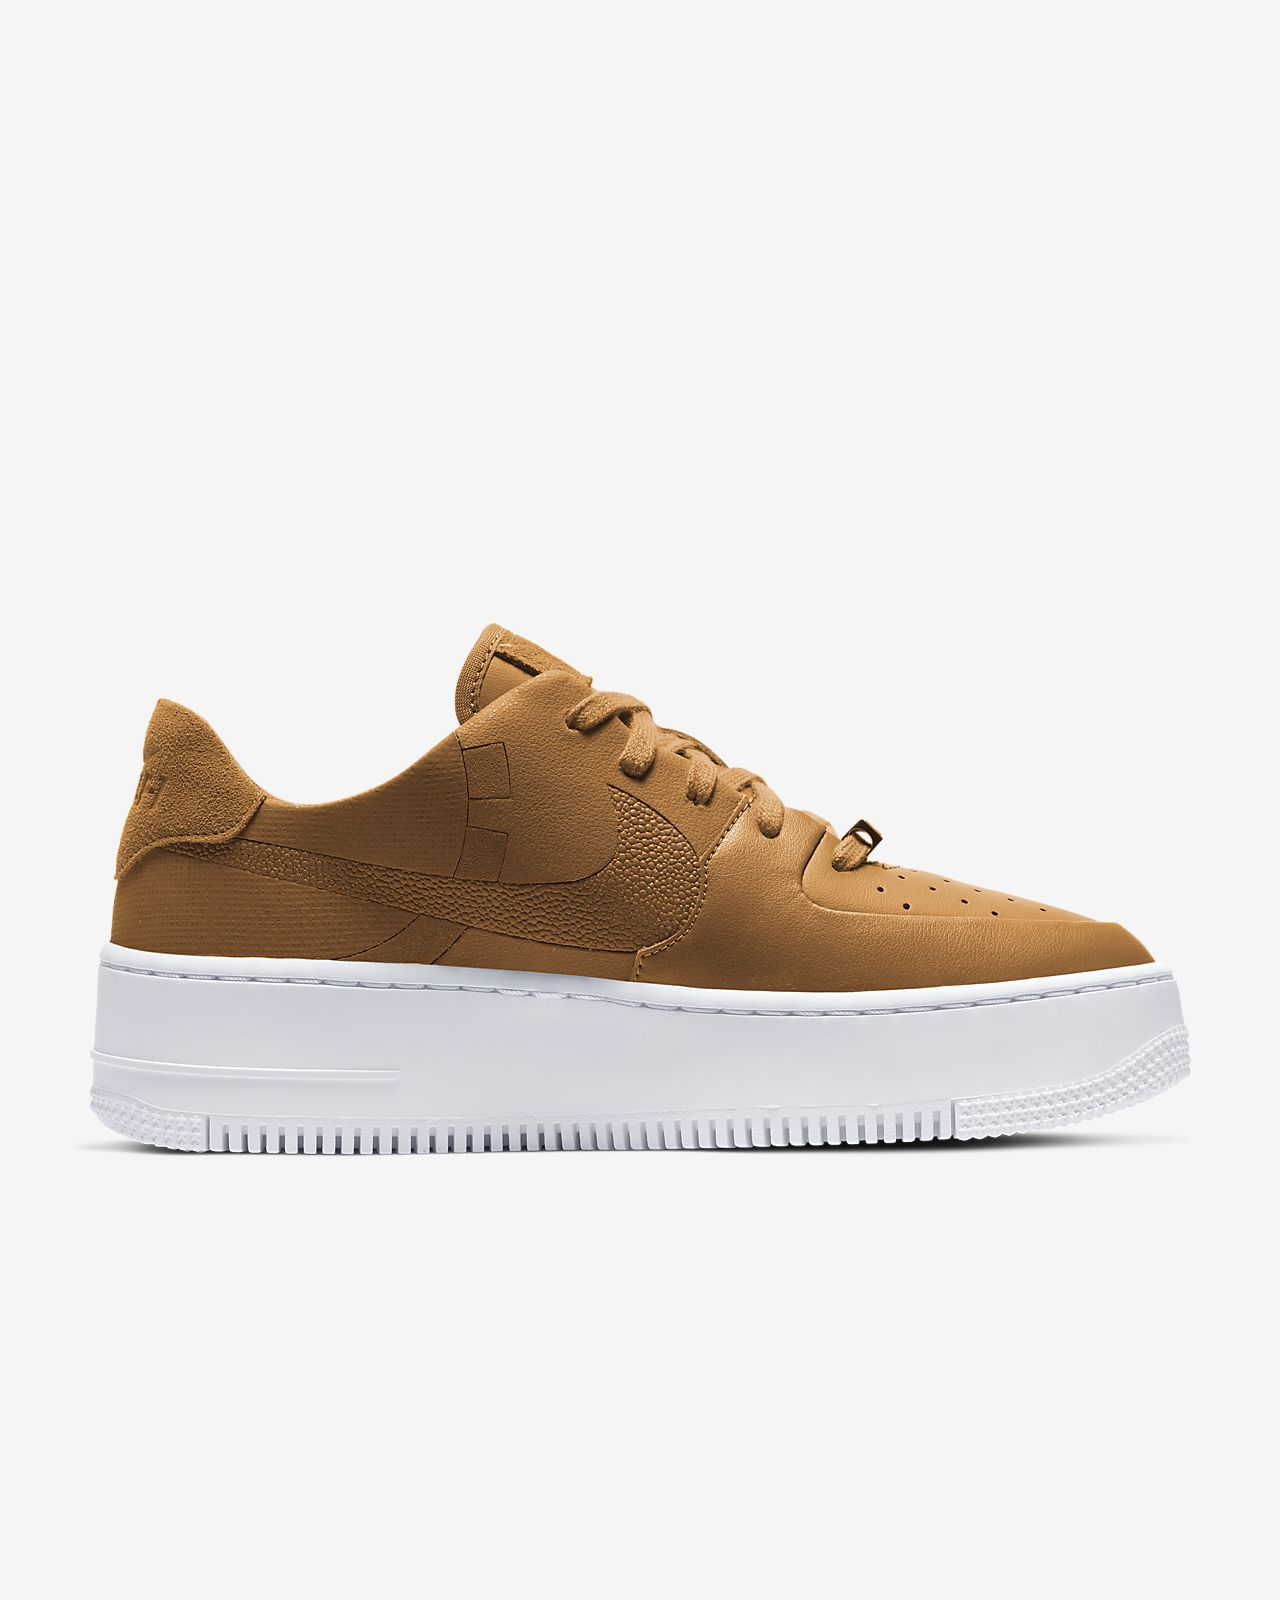 Nike Air Force 1 Sage Low LX Kadin Ayakkabisi